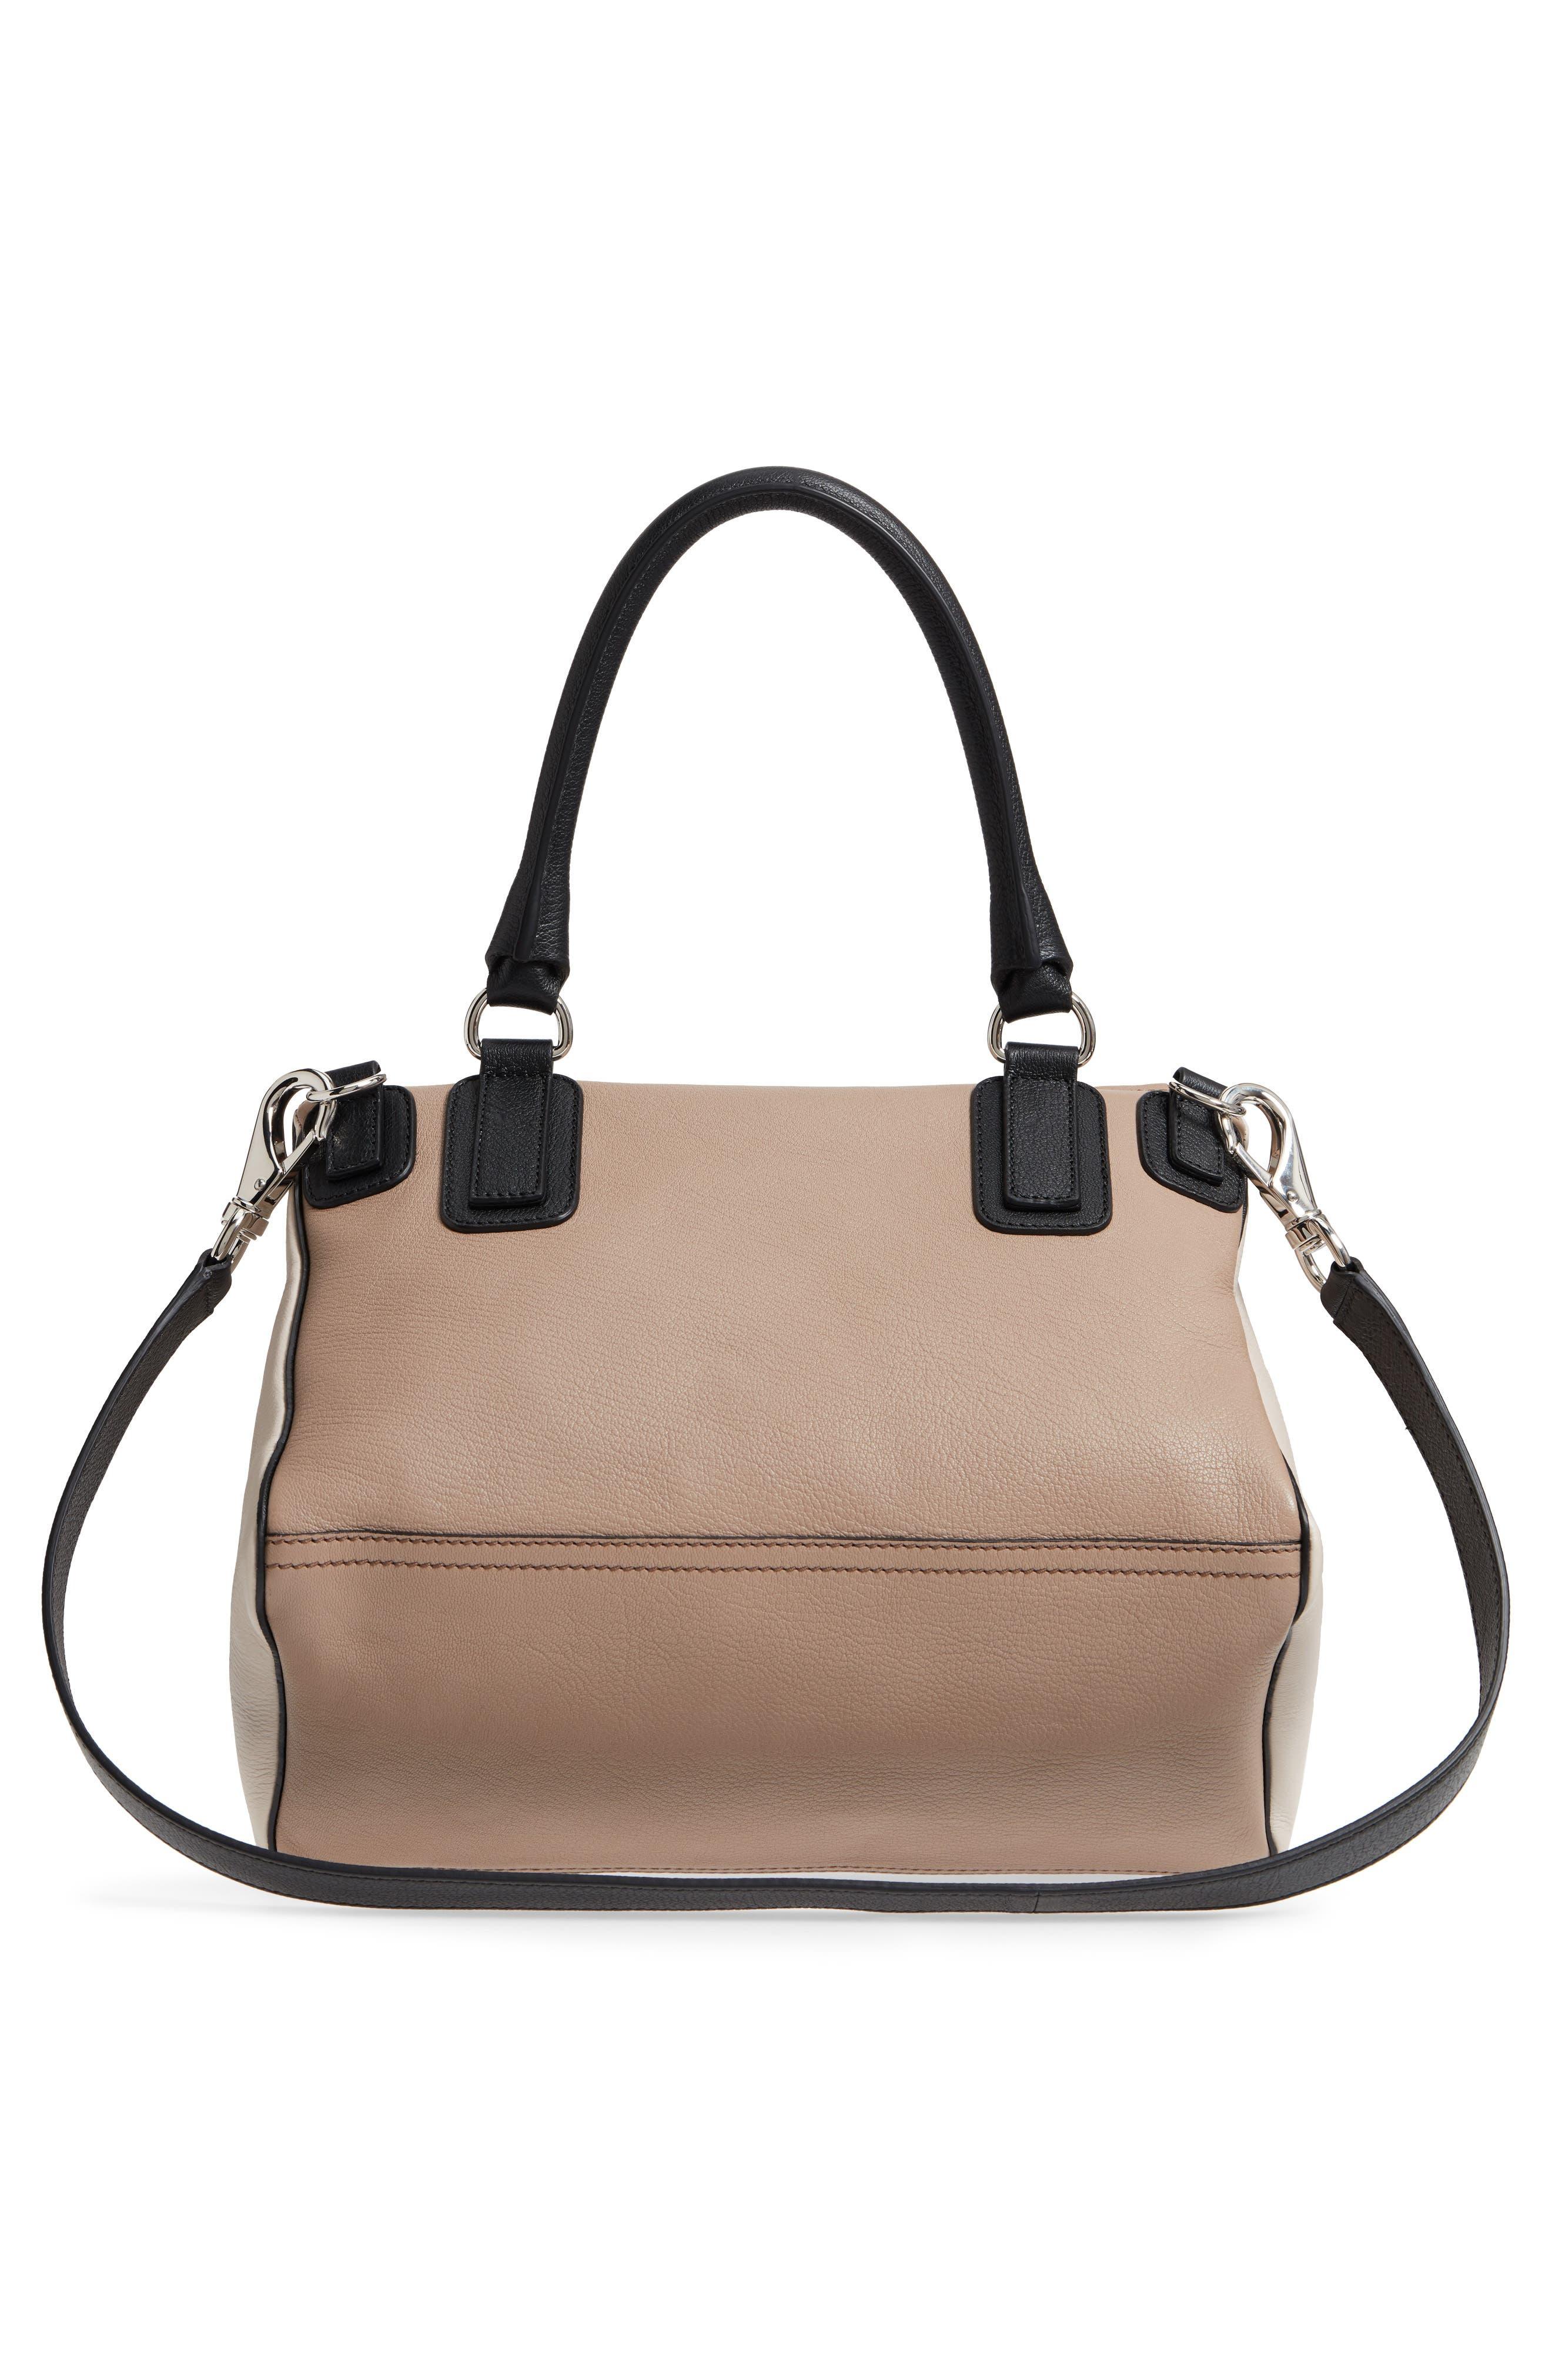 Medium Pandora Box Tricolor Leather Crossbody Bag,                             Alternate thumbnail 3, color,                             Linen